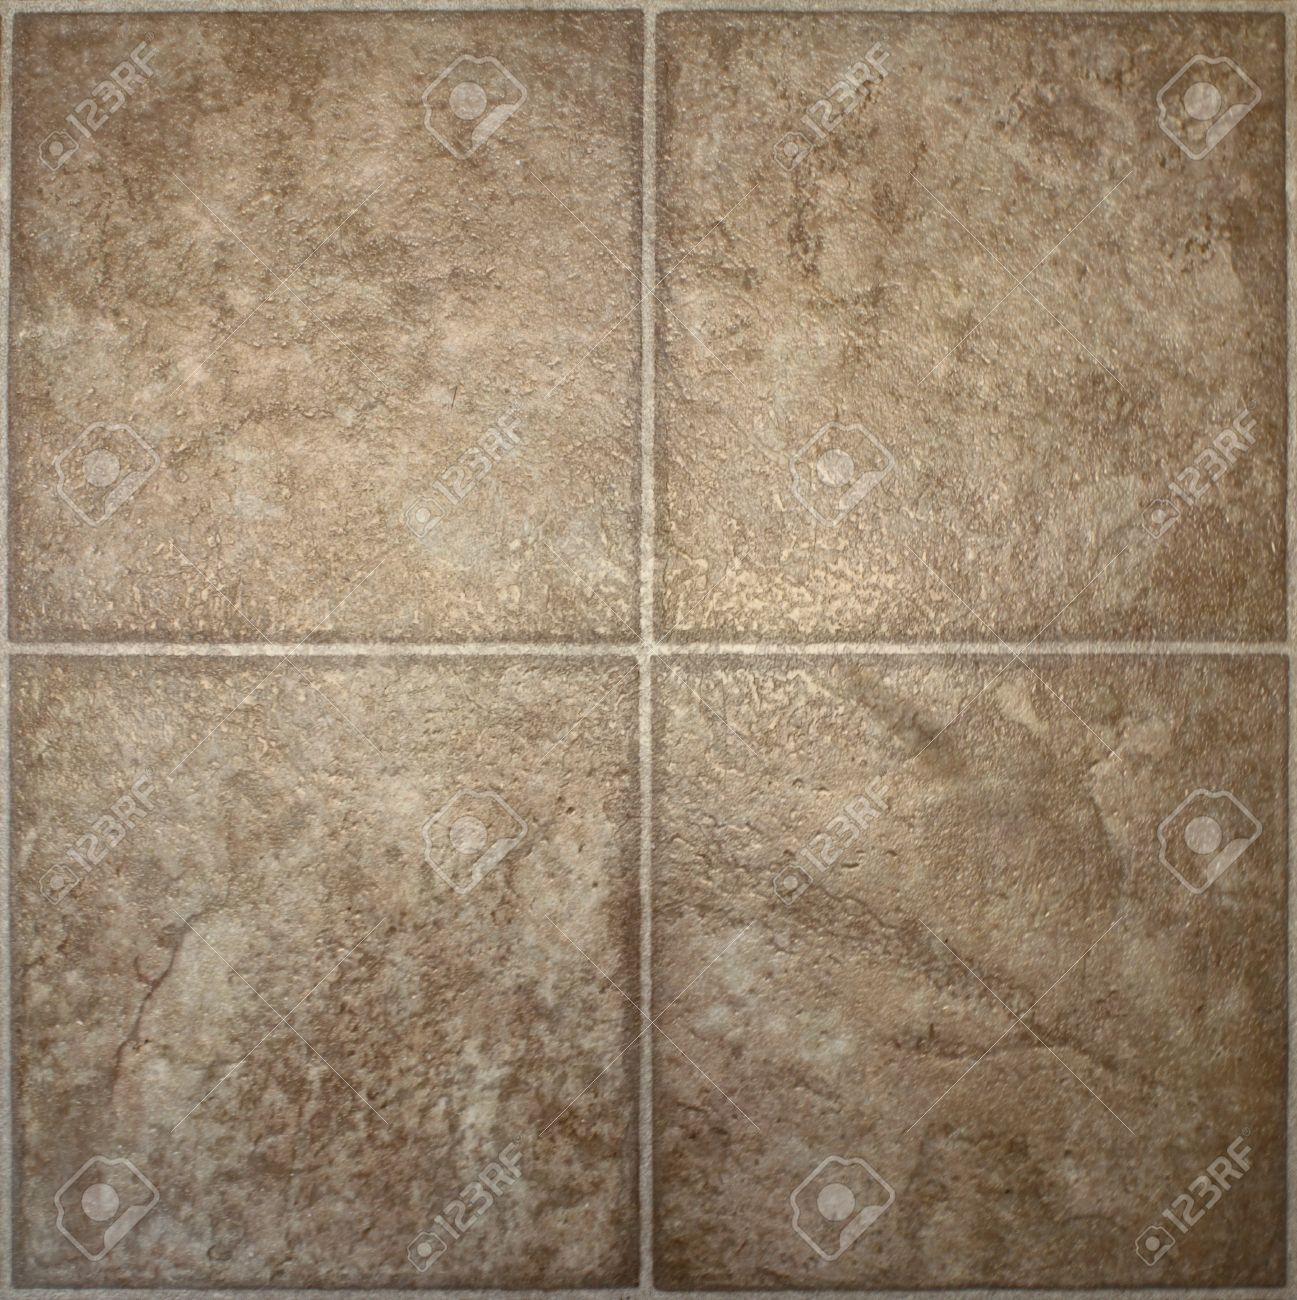 Four Squares Of Brown, Textured Linoleum Floor Tile. Stock Photo ...